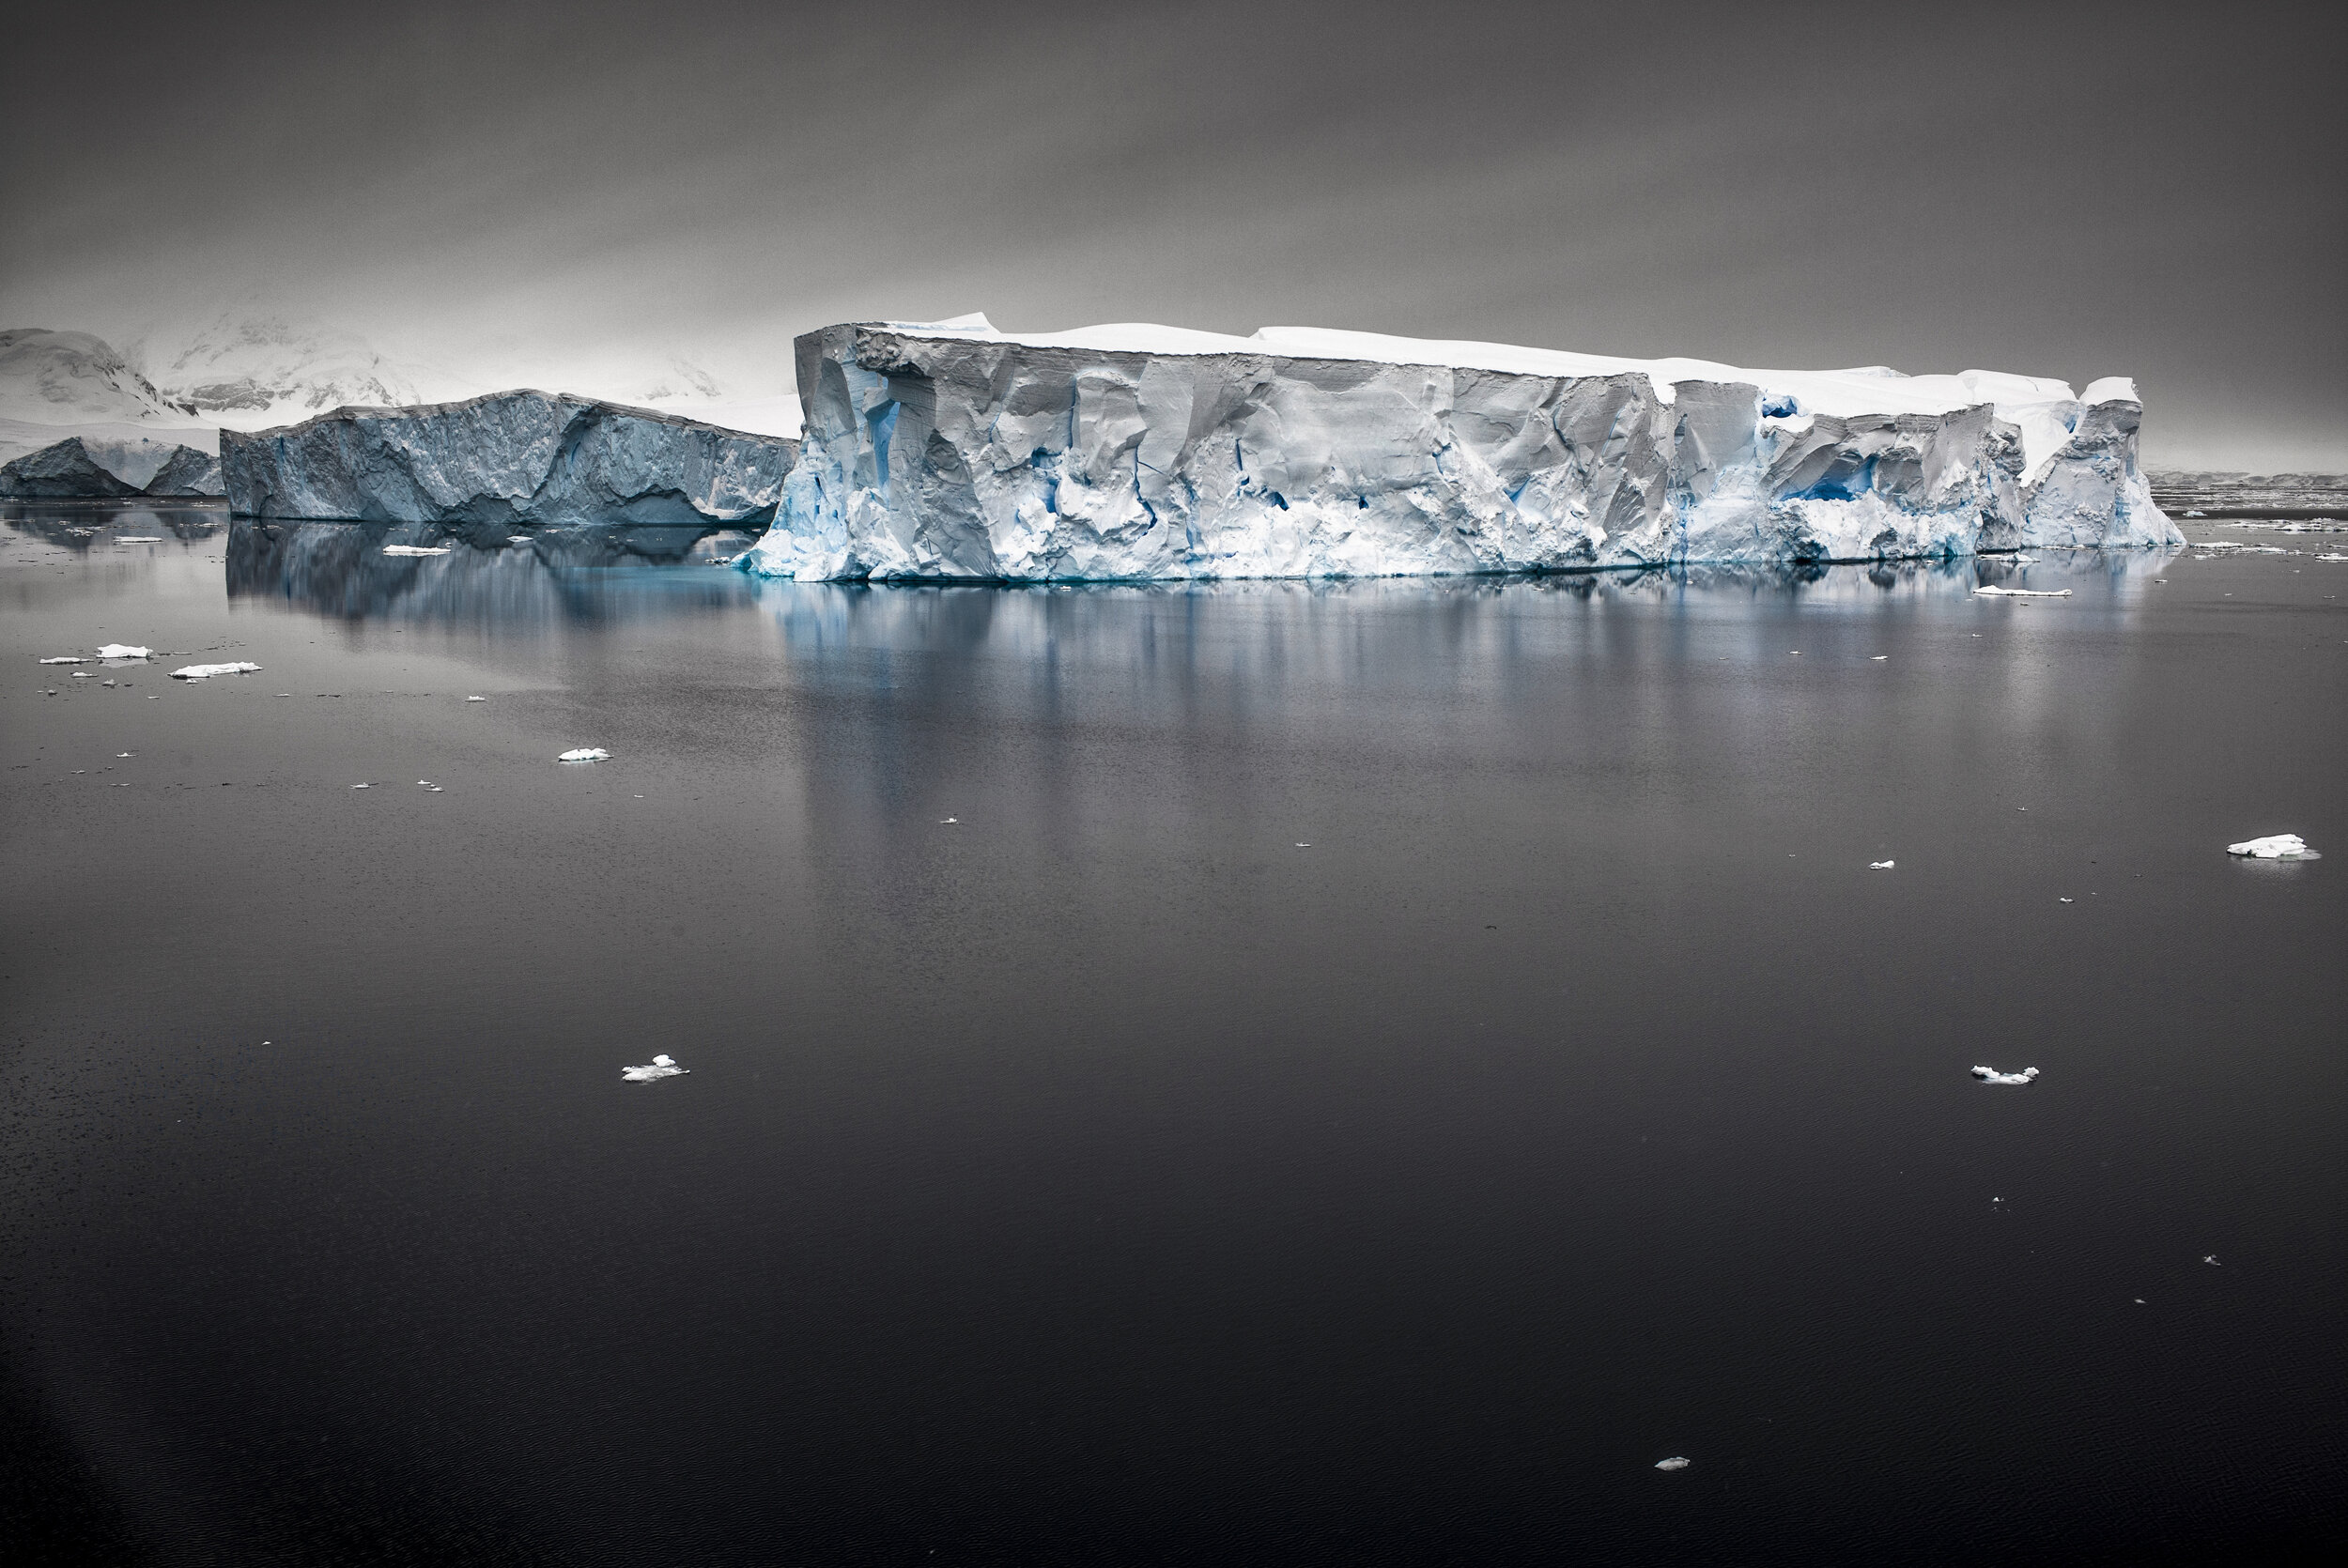 manuel_uebler_antarctica_twilight_005.jpg